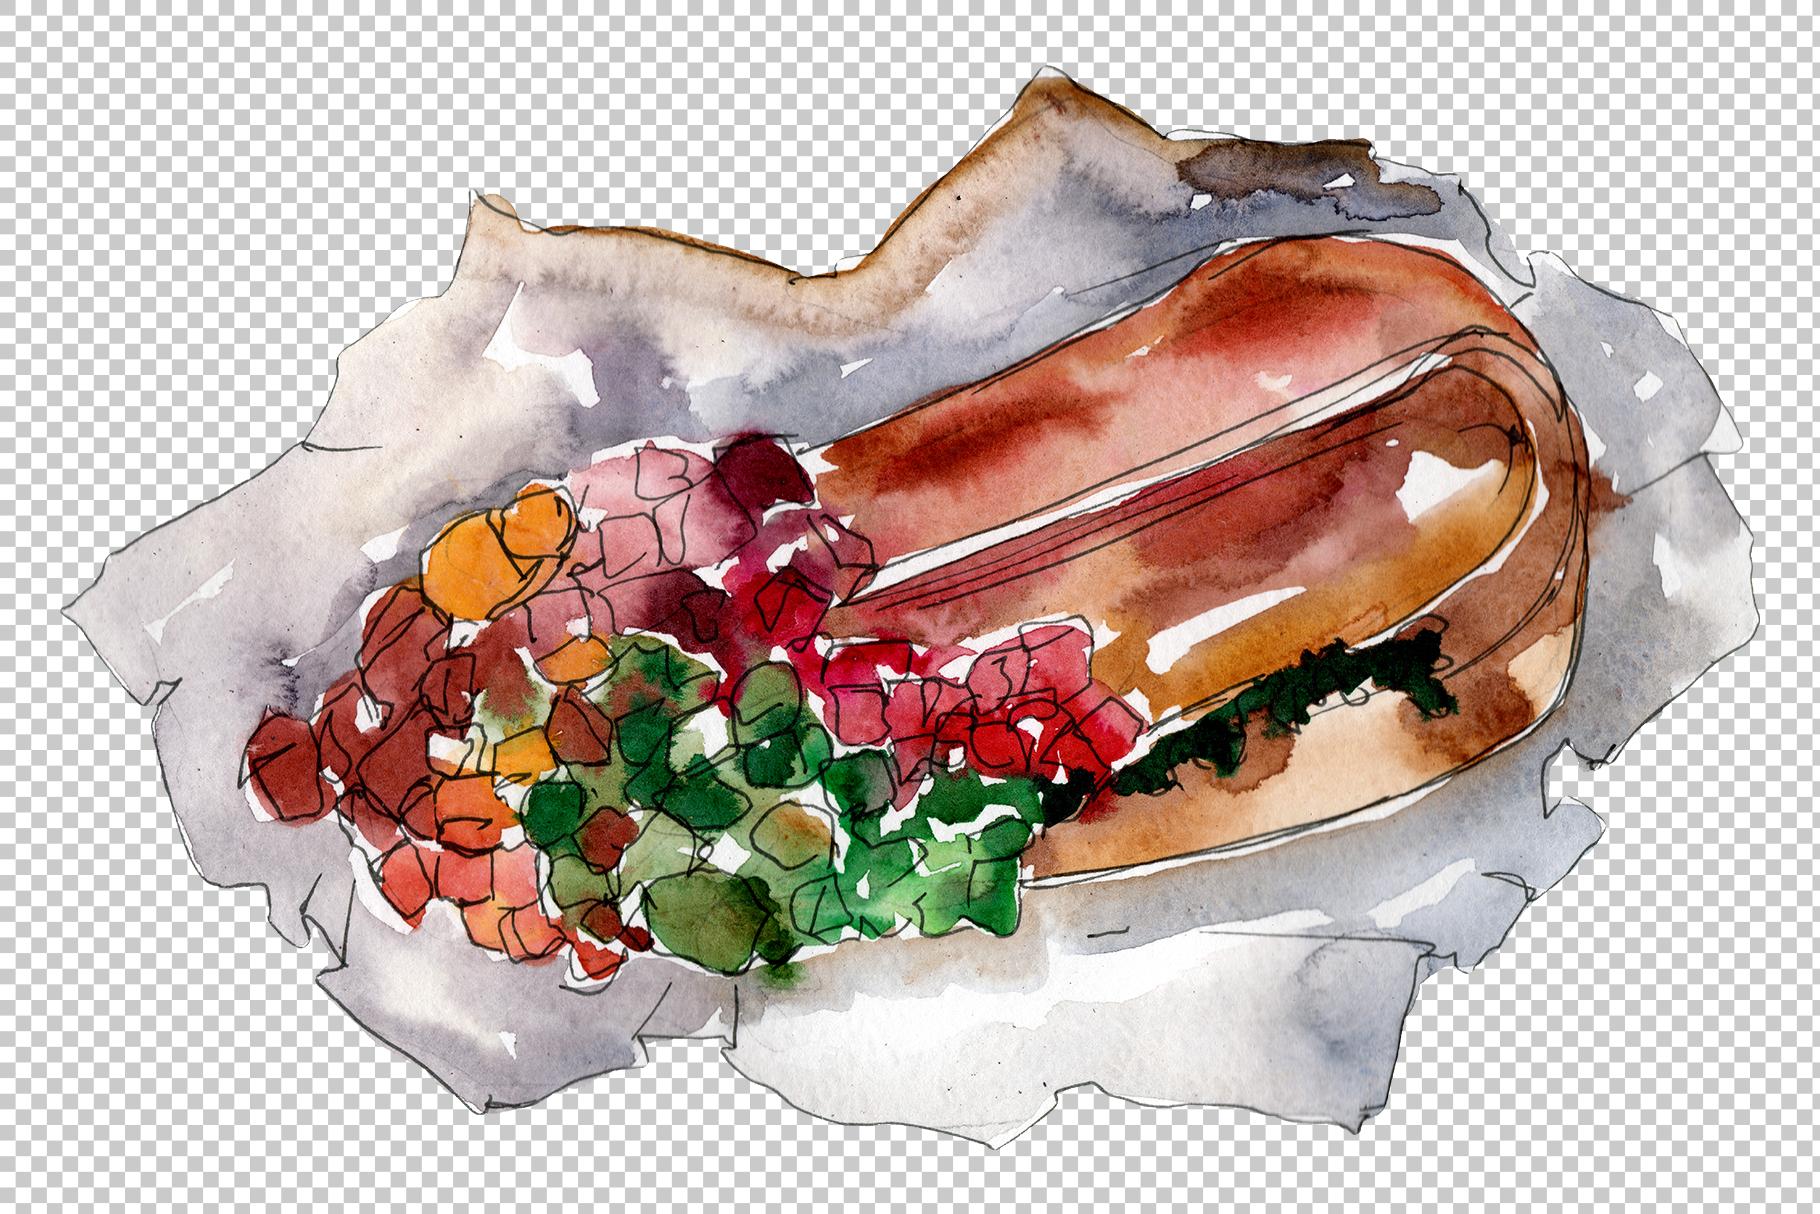 Hot dog in Ukrainian watercolor png example image 3